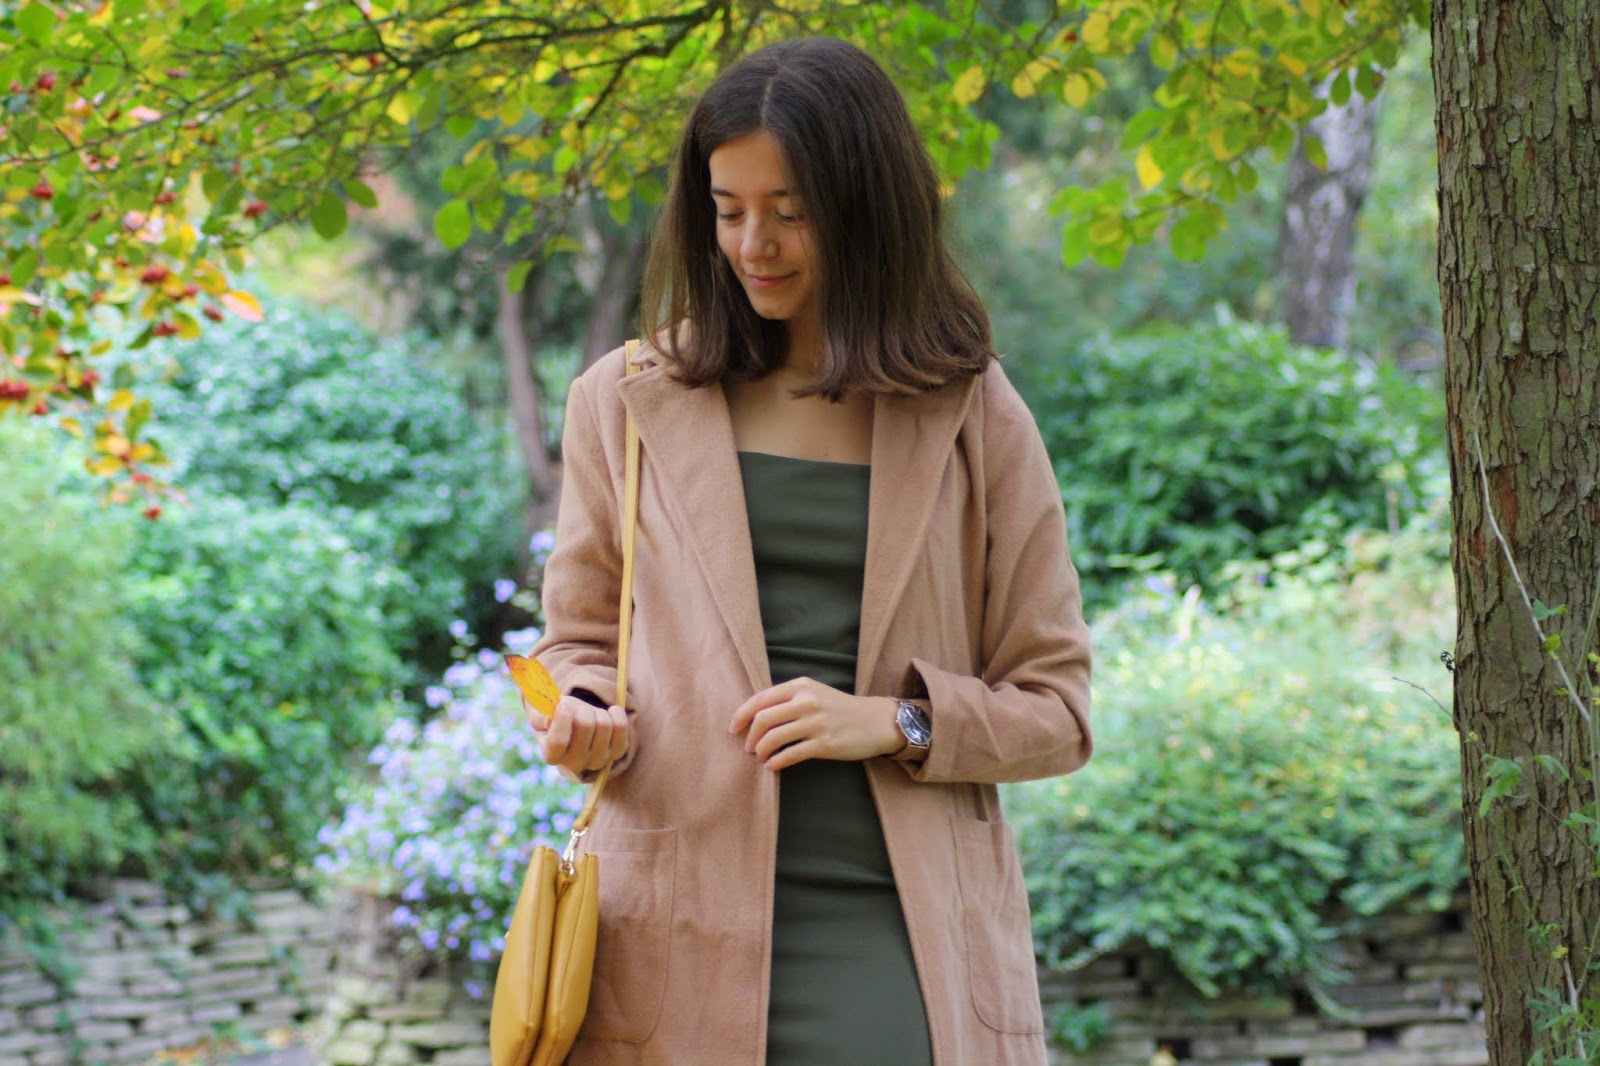 brunette standing amongst autumn leaves, wearing brown jacket and khaki dress